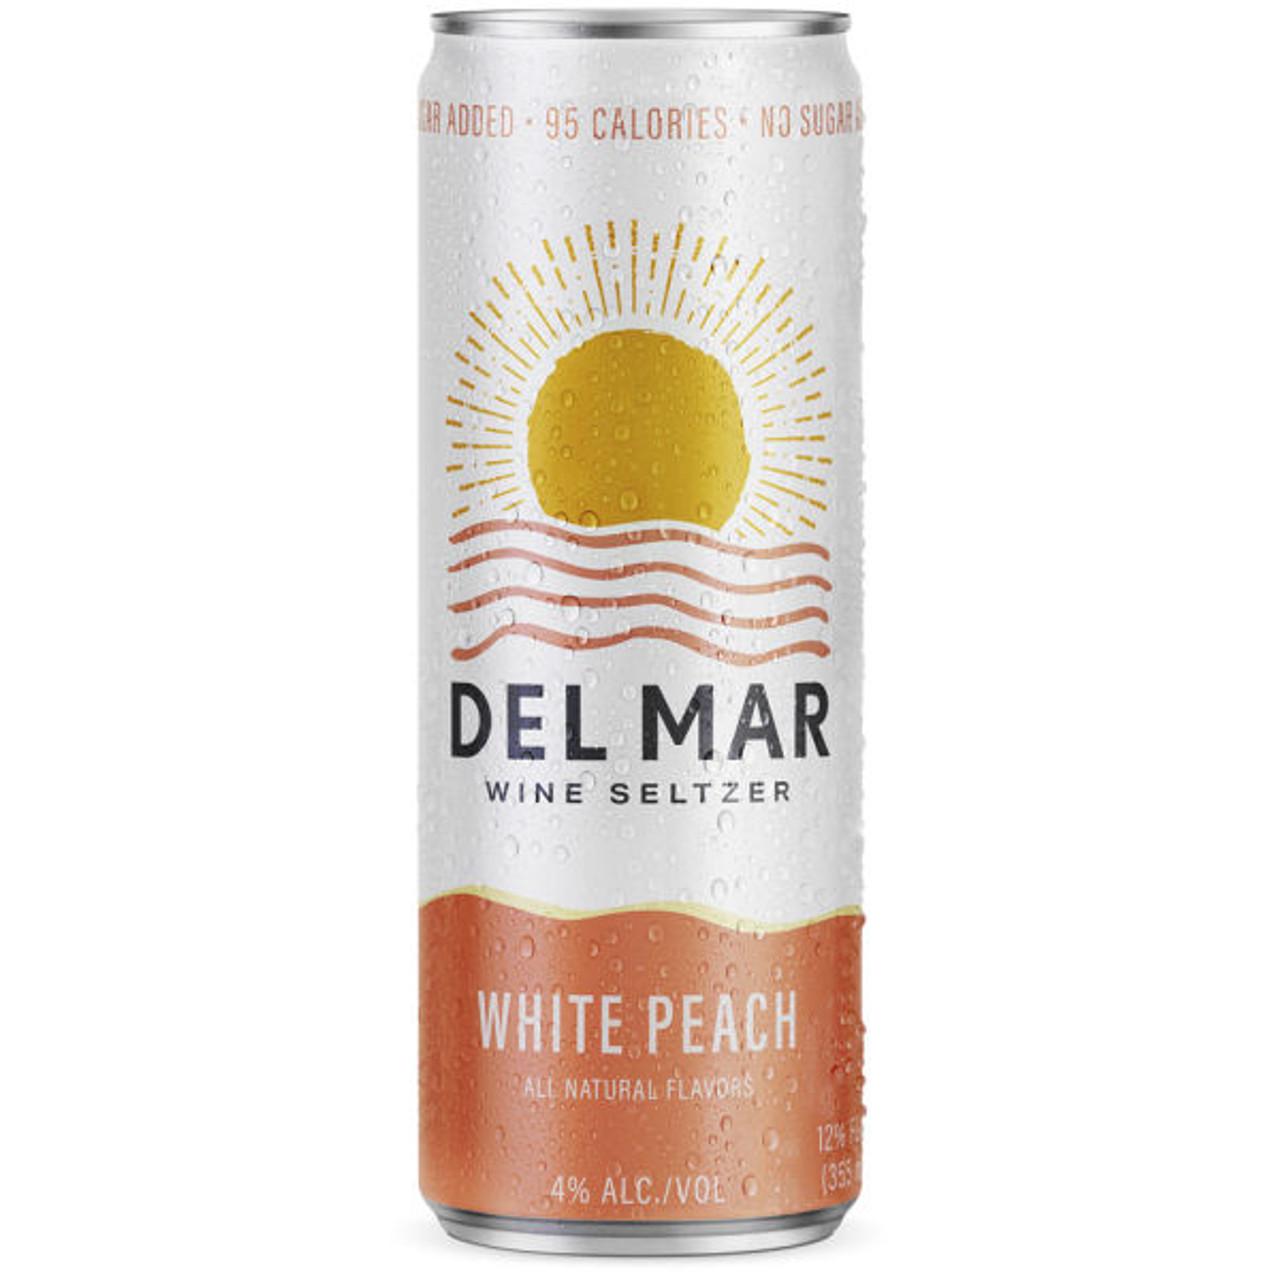 Del Mar White Peach Wine Seltzer 12oz 4 Pack Cans